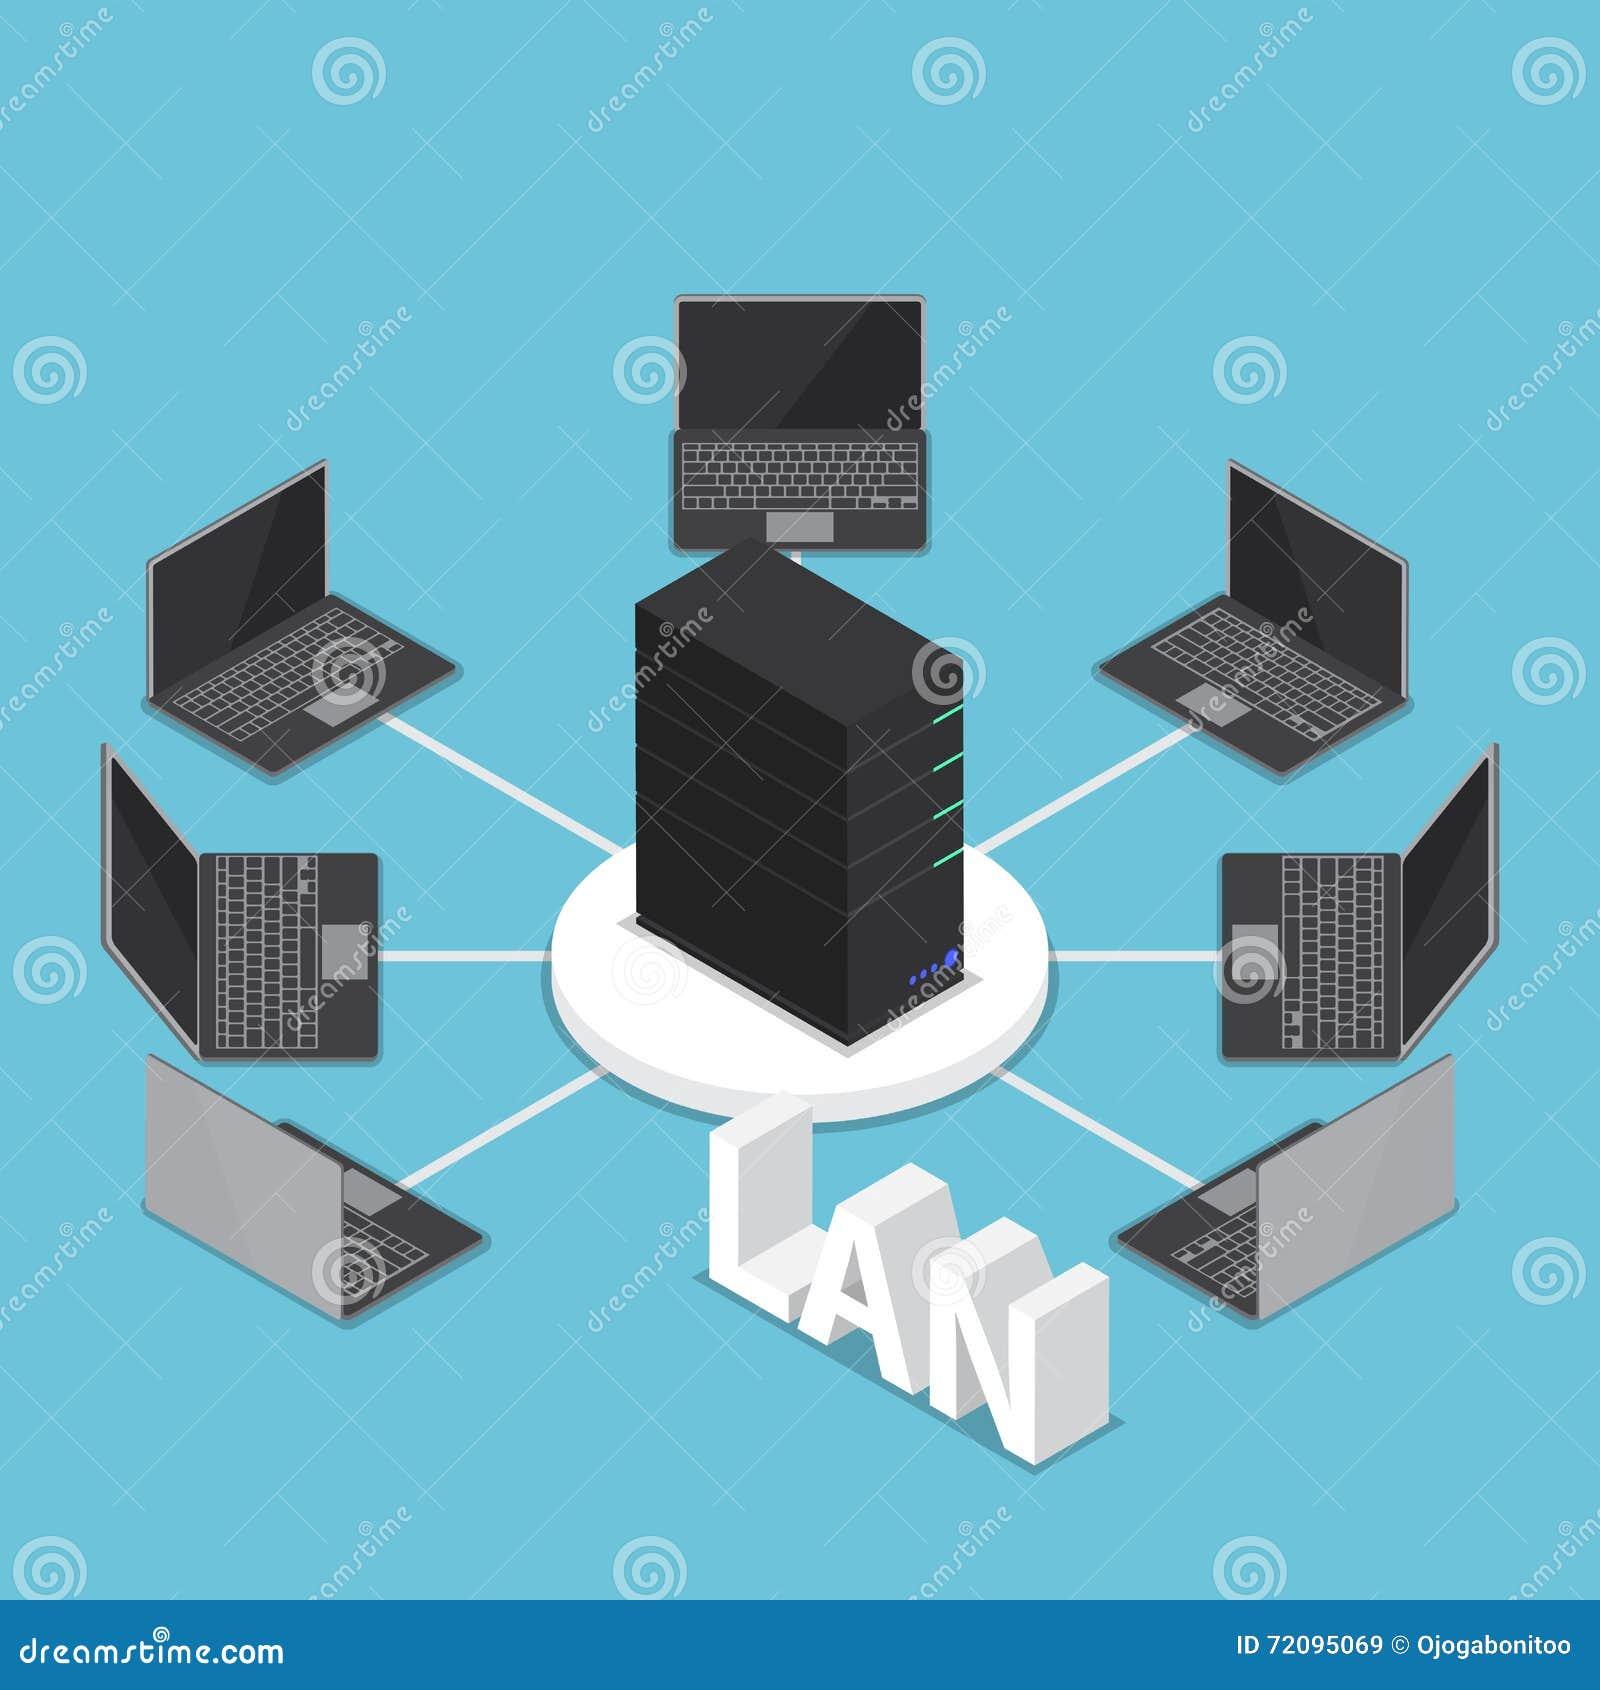 Isometric LAN Network Diagram Stock Vector - Illustration of network ...